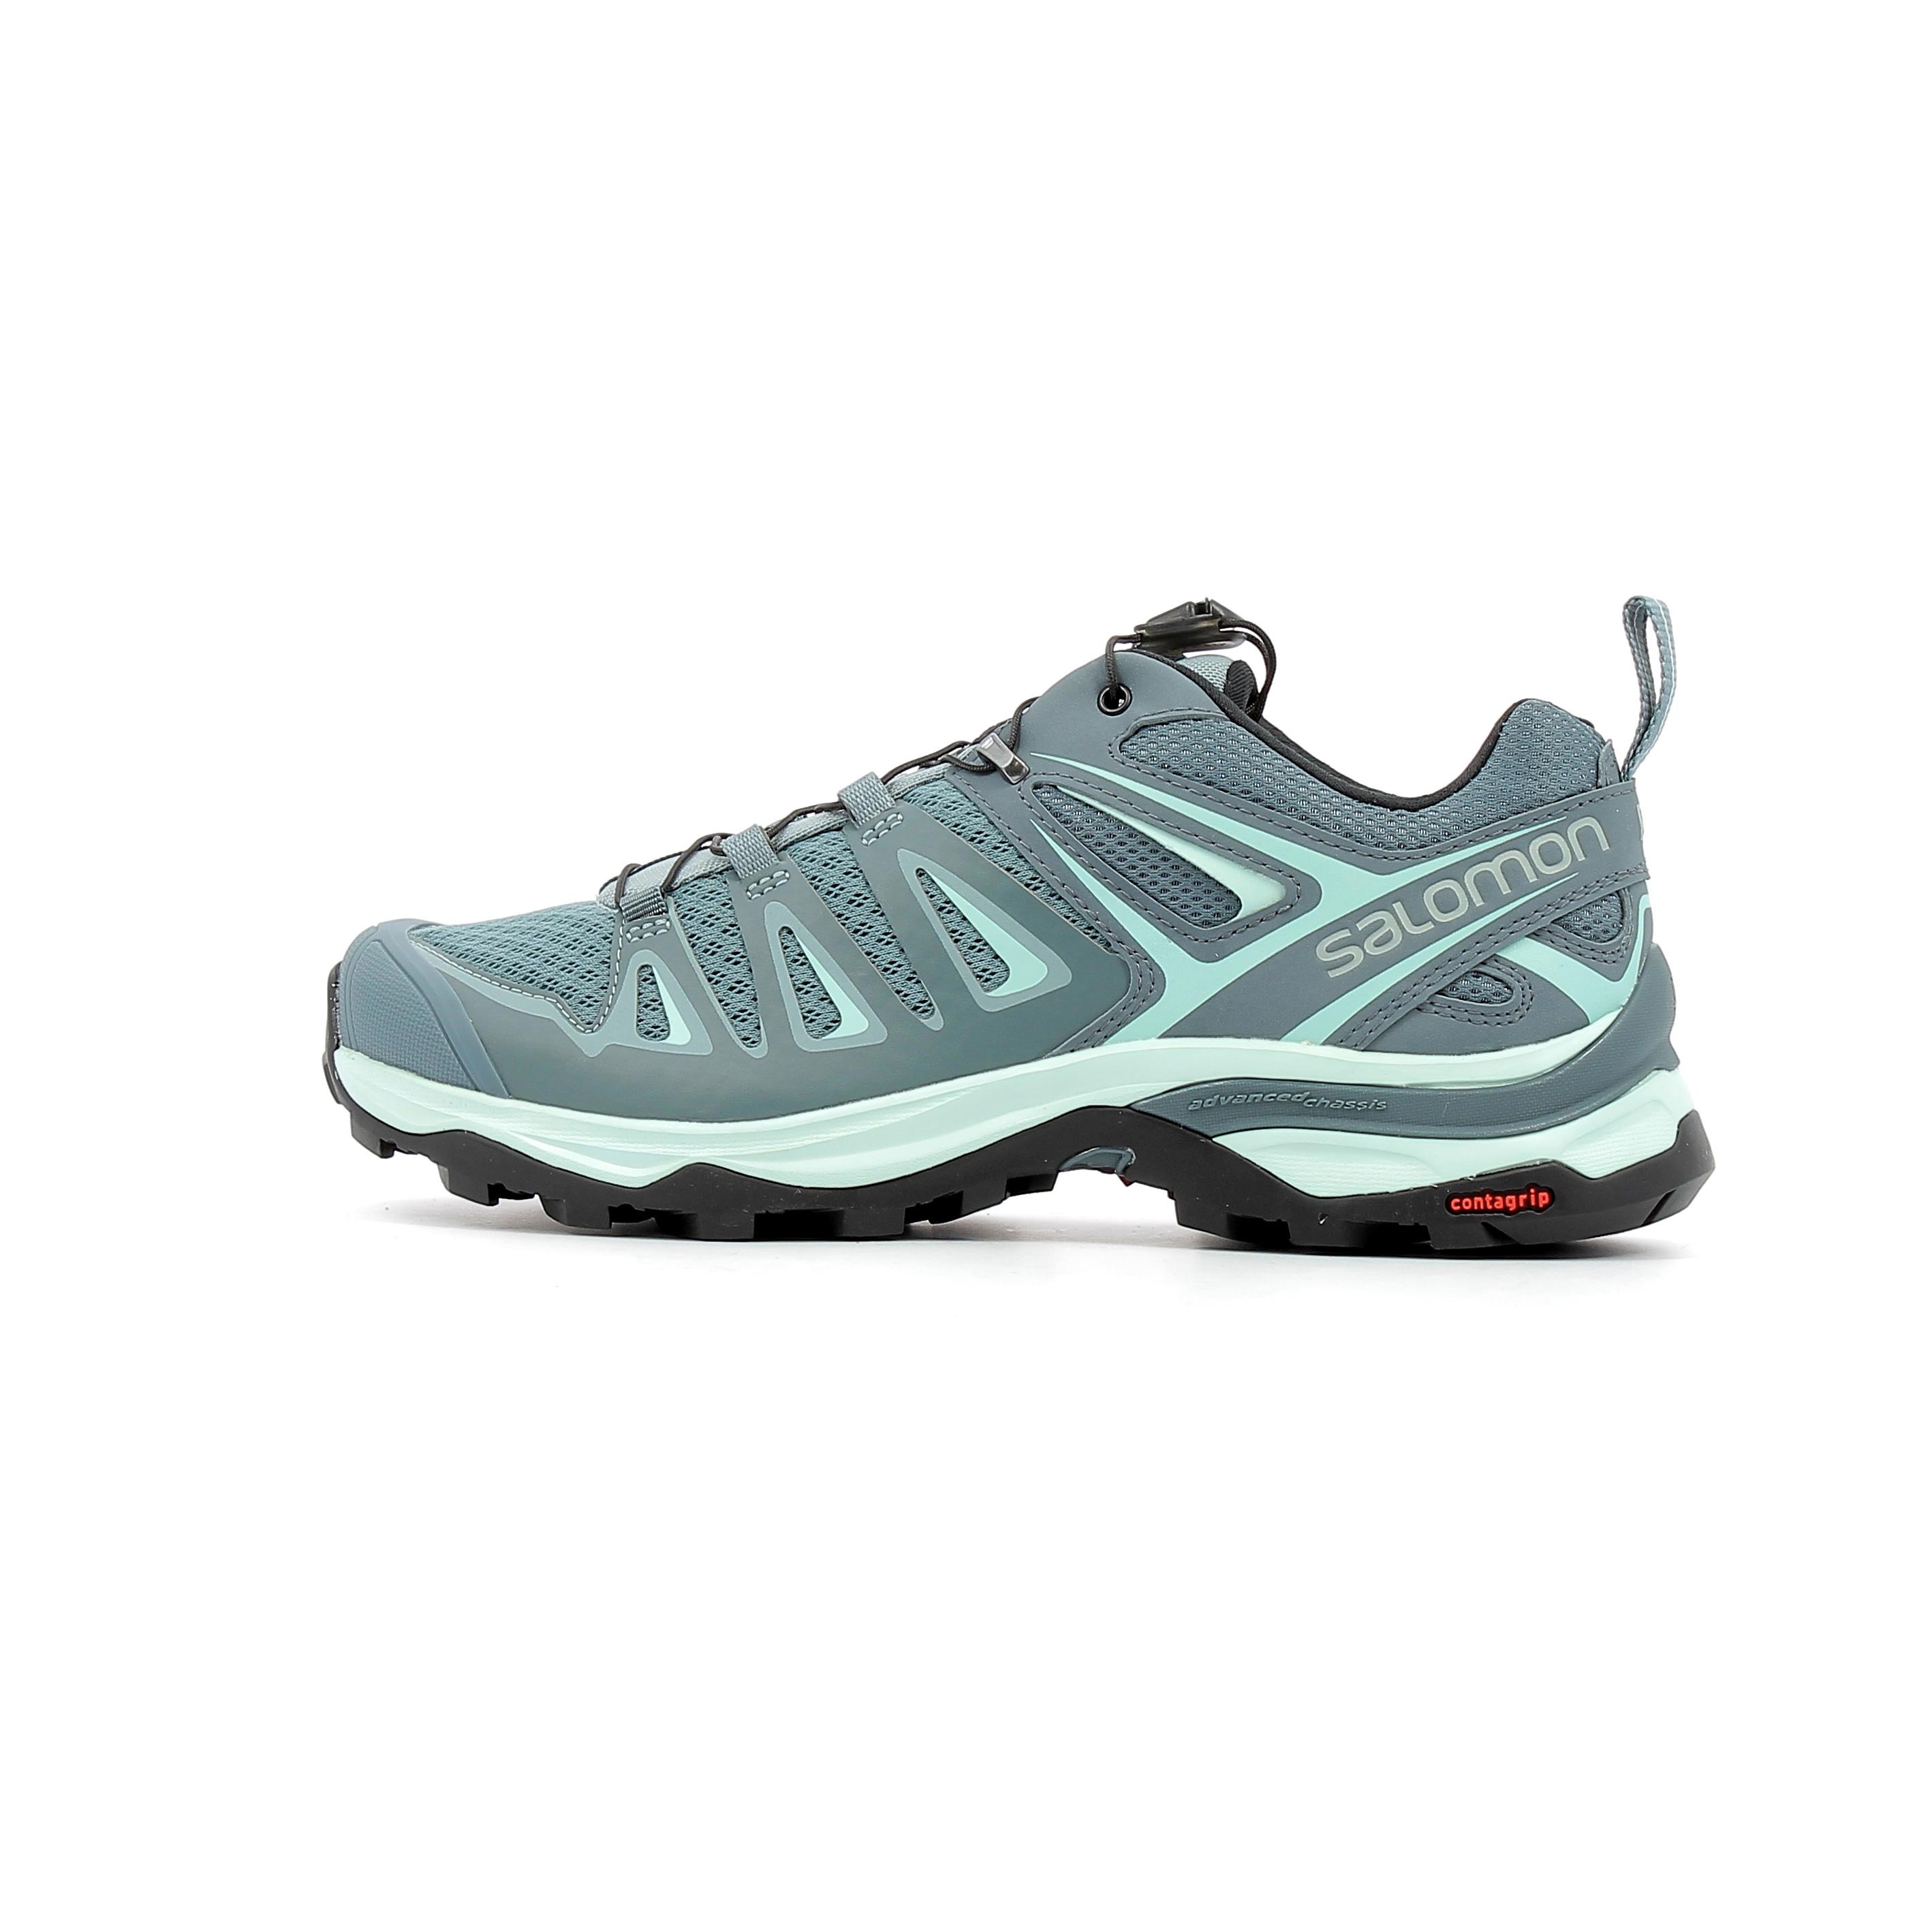 best service a7076 d14bb Chaussure de randonnée Salomon X Ultra 3 W